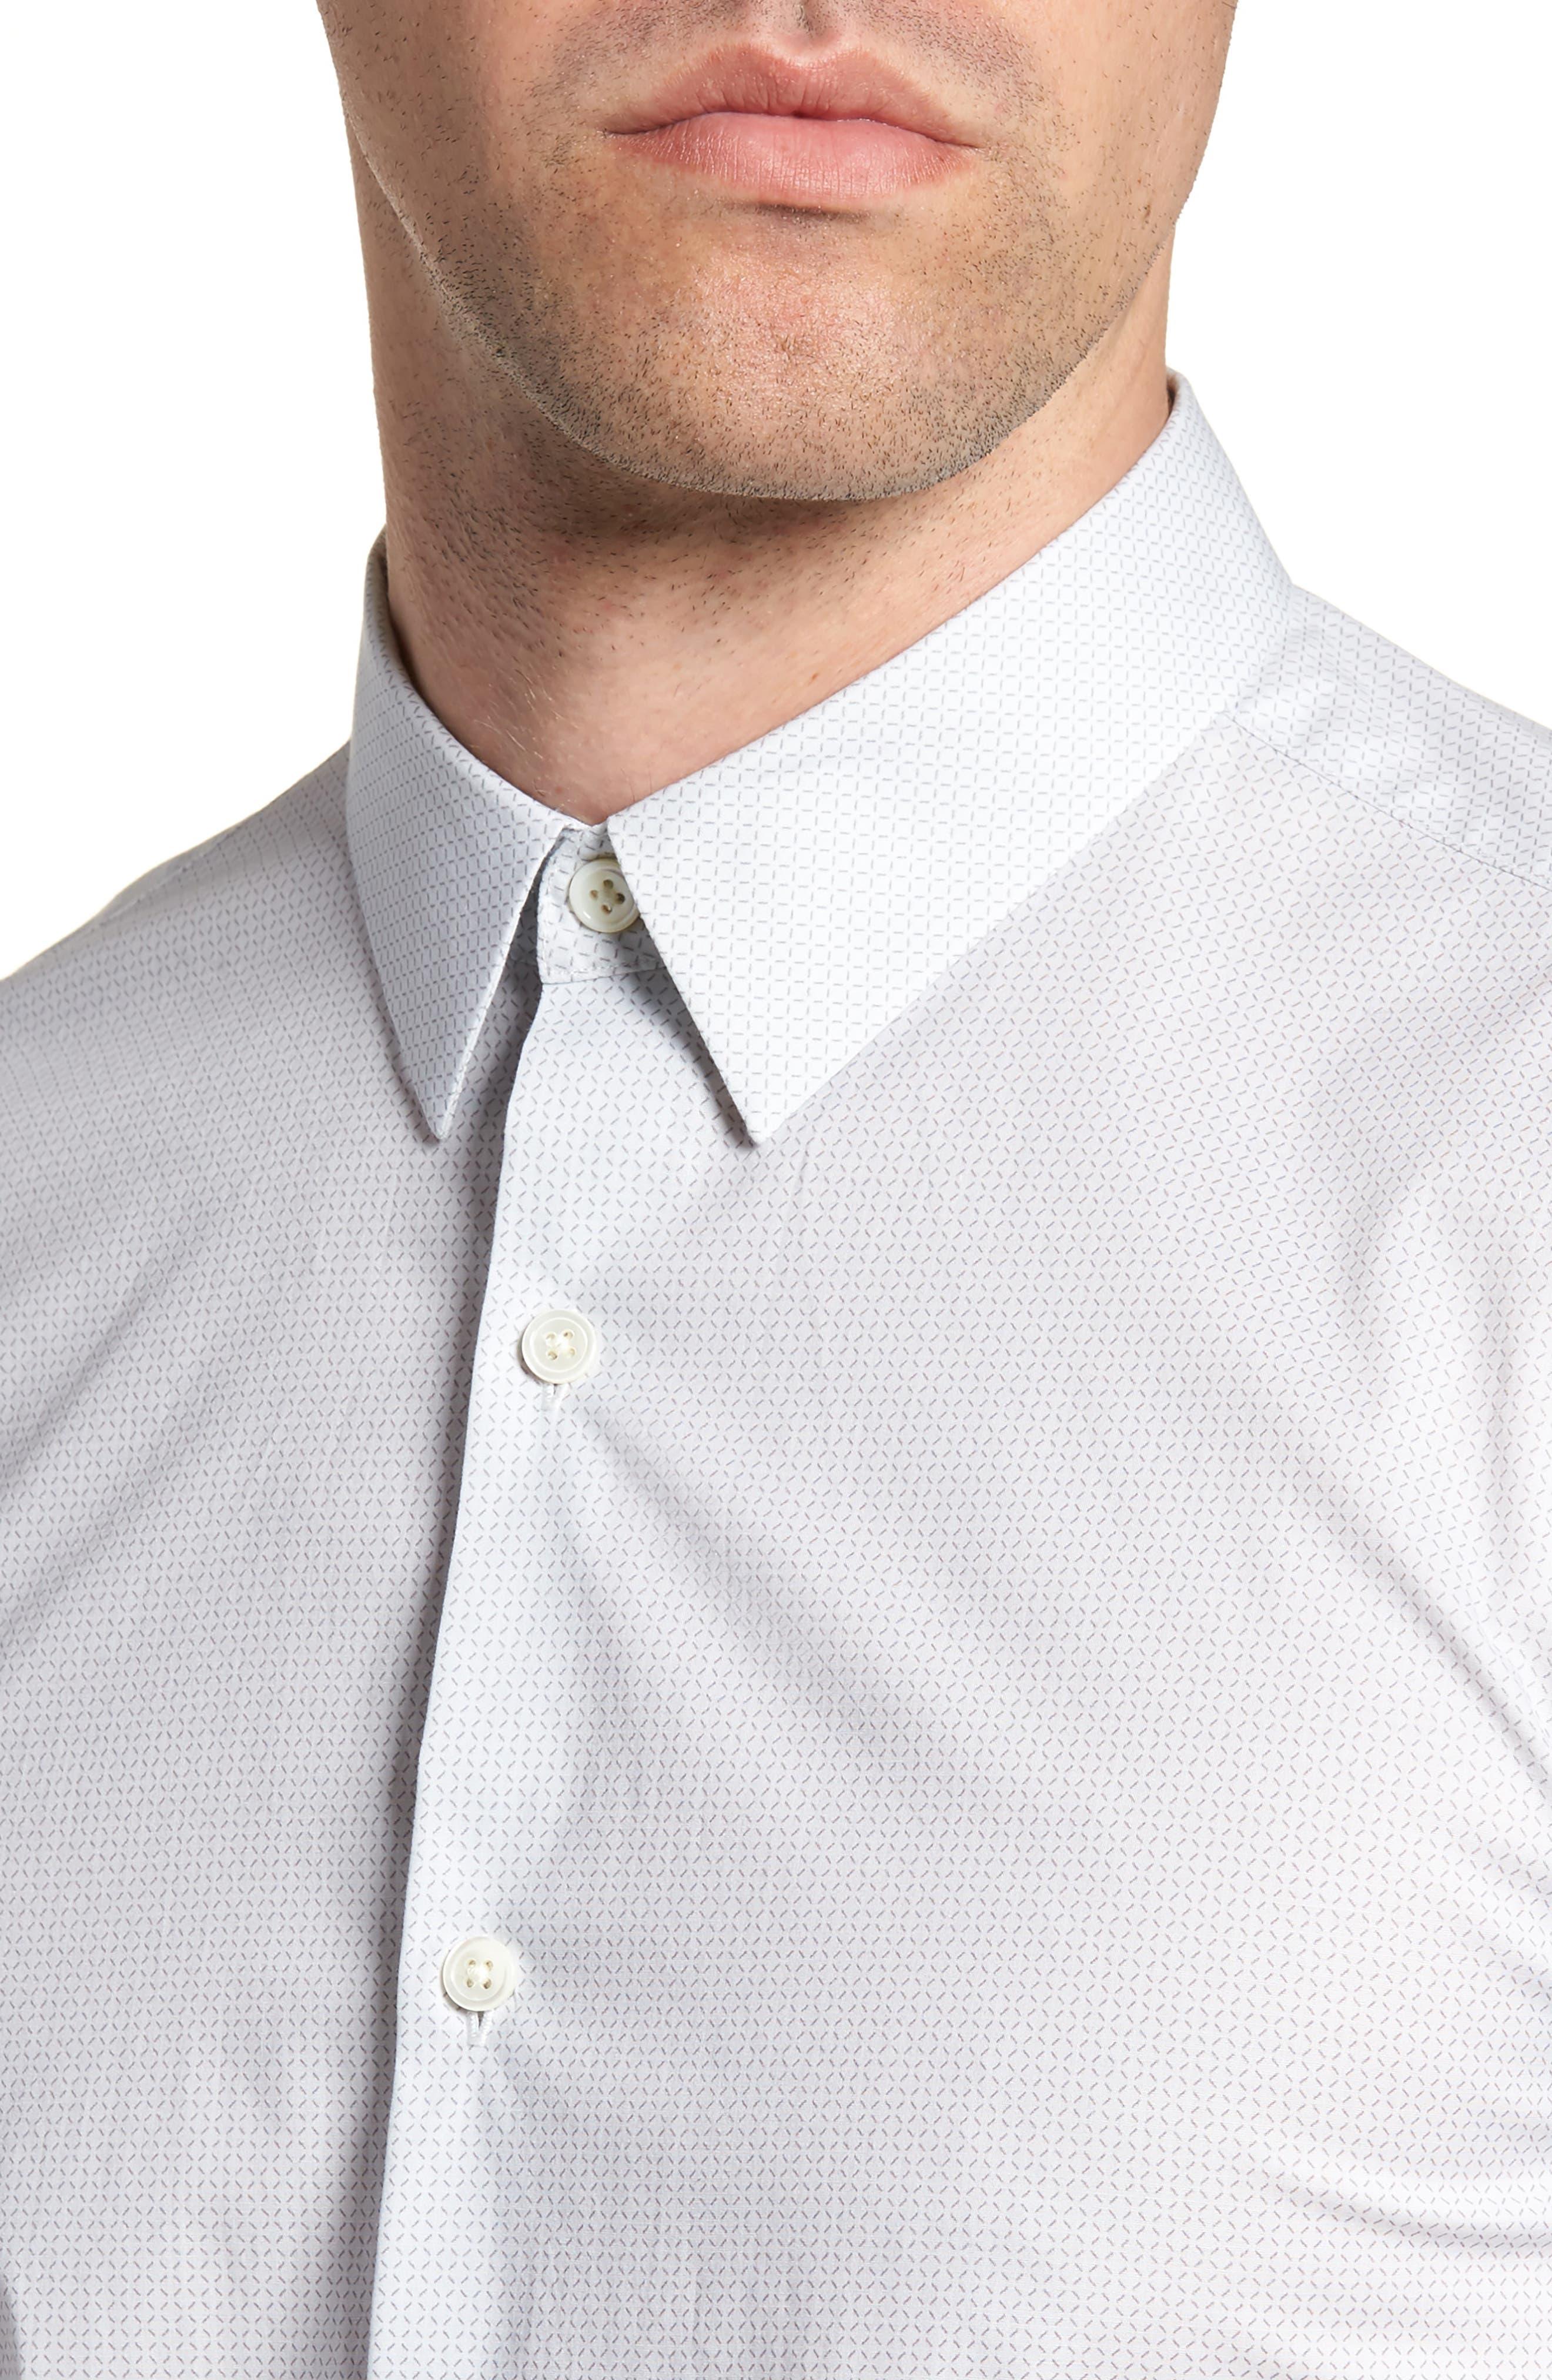 Irving Sillar Slim Fit Sport Shirt,                             Alternate thumbnail 4, color,                             097